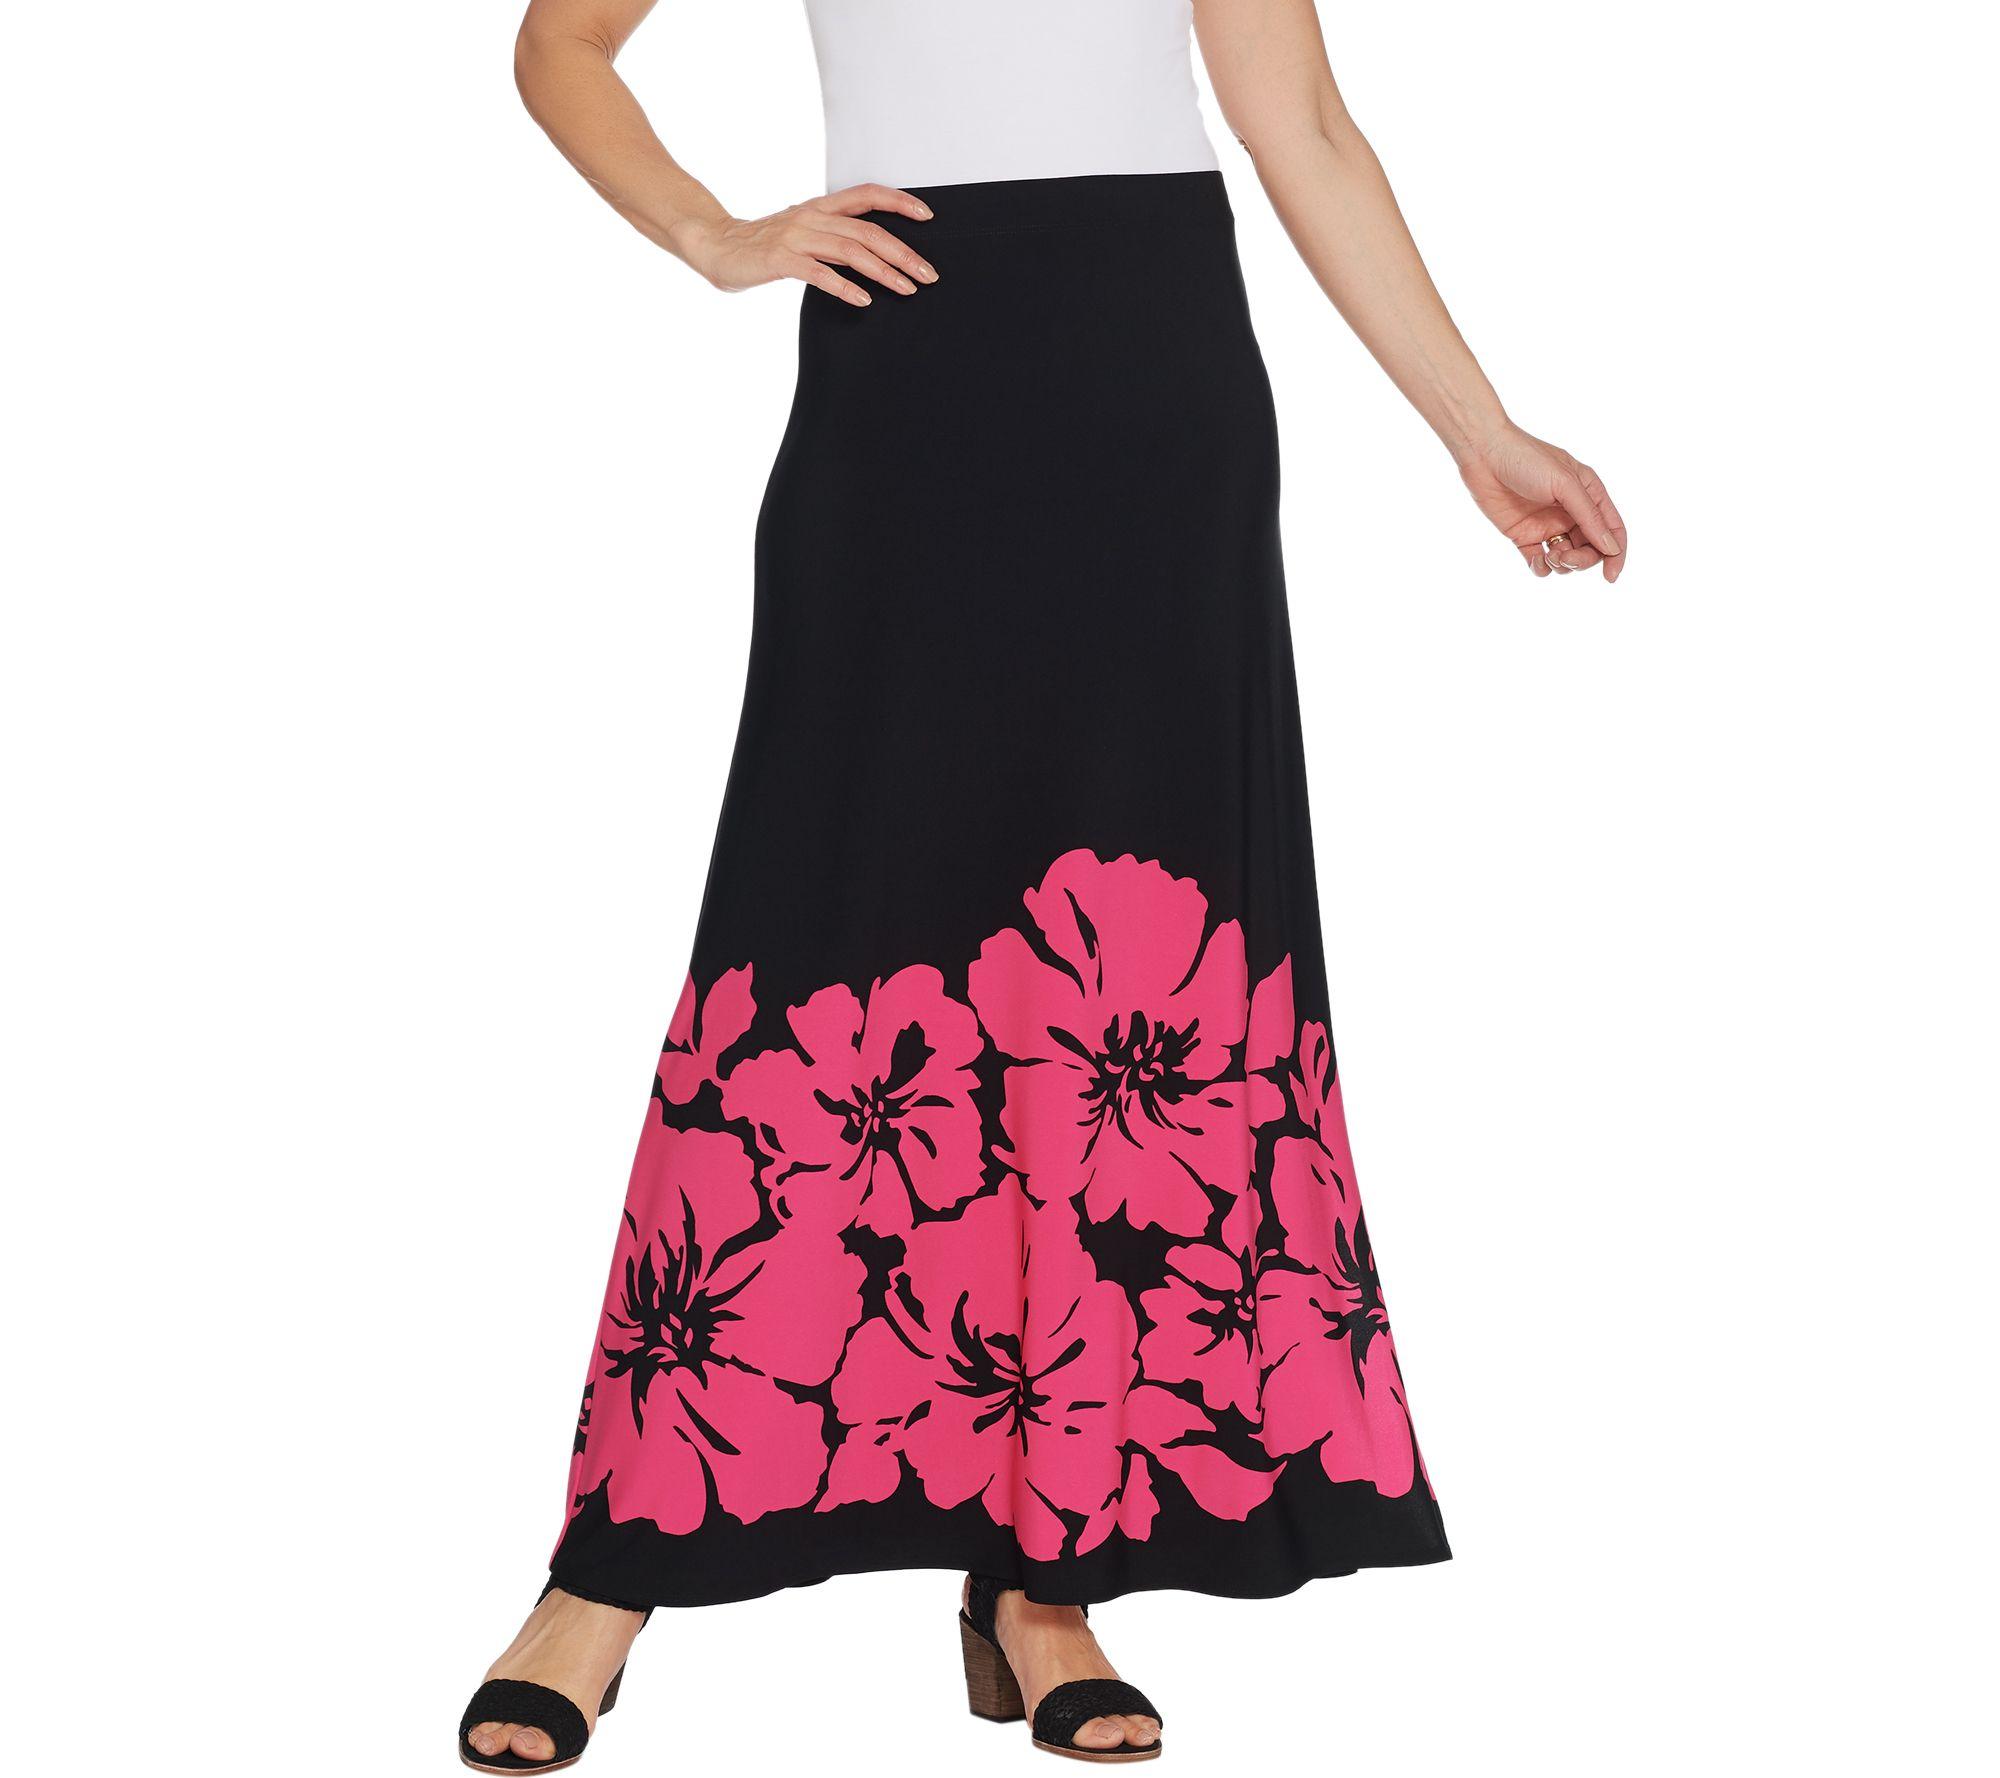 3de7615dc1 Susan Graver Printed Liquid Knit Maxi Skirt - Page 1 — QVC.com